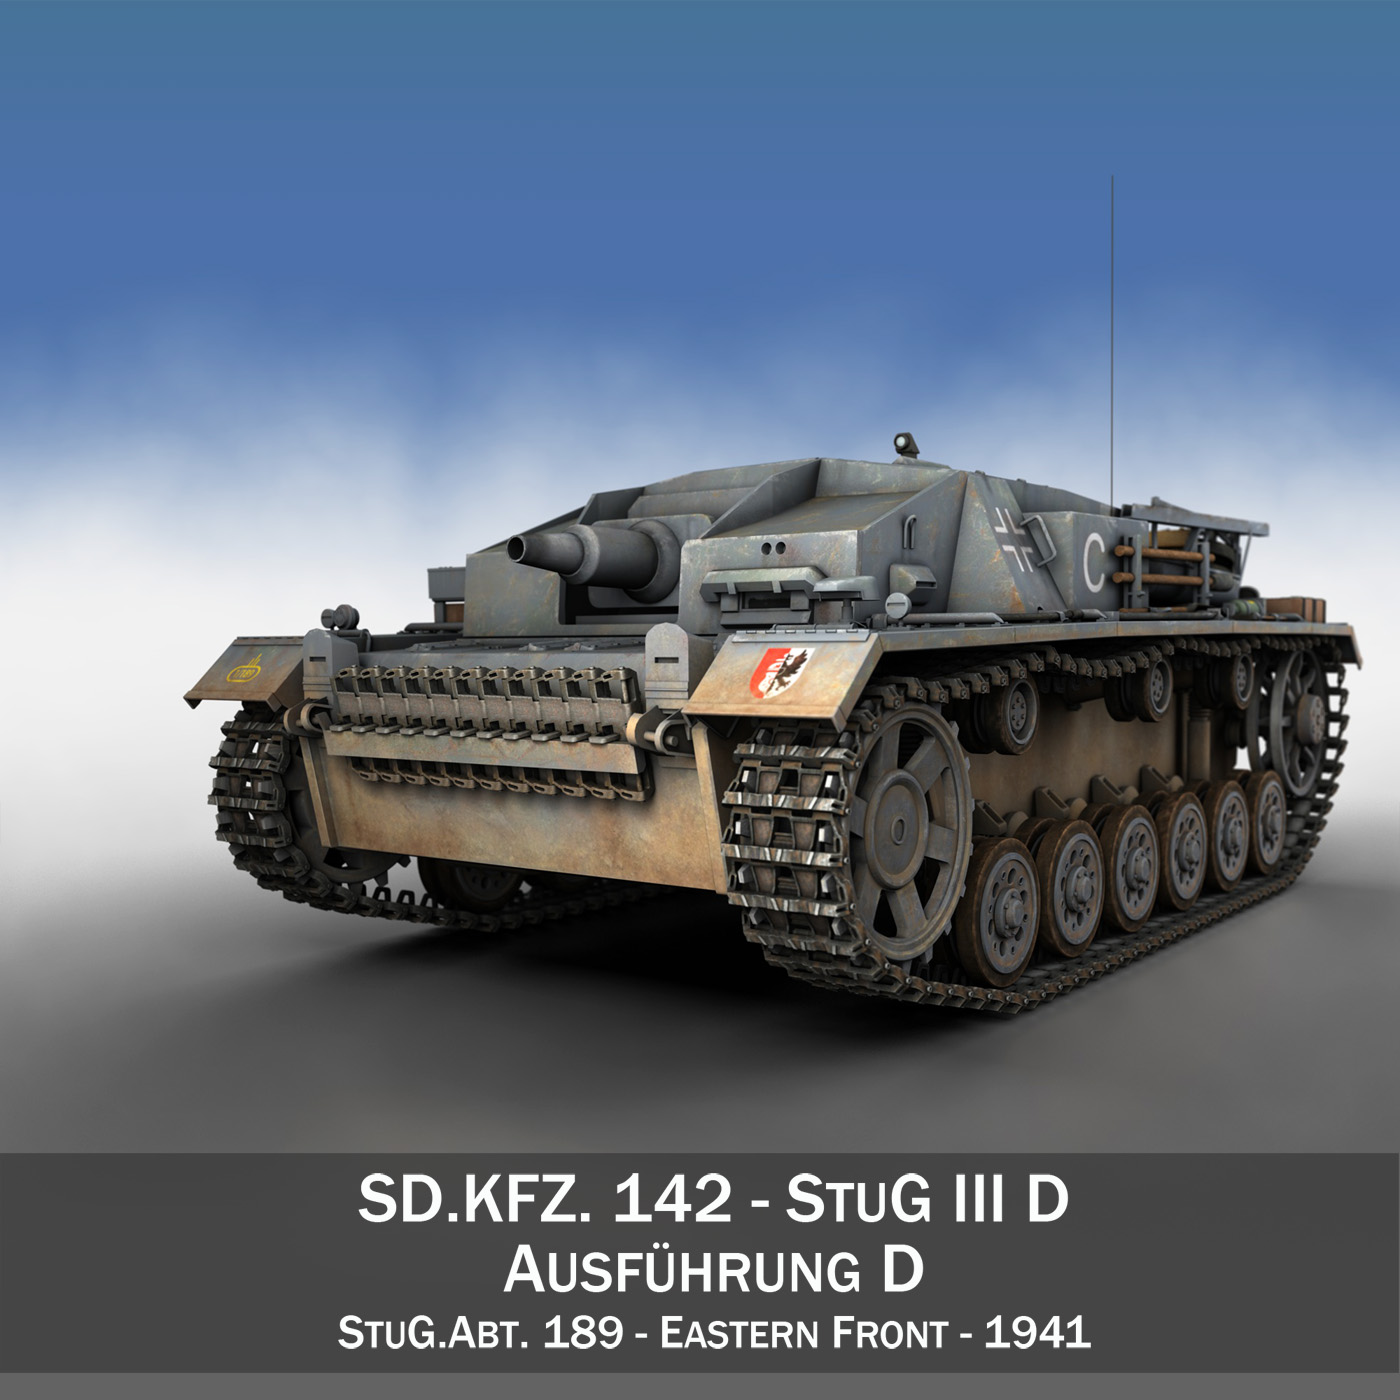 stug iii - ausf.d - stug.abt. 189 3d múnla 3ds fbx lb lw lw lj lv lUMXd 4